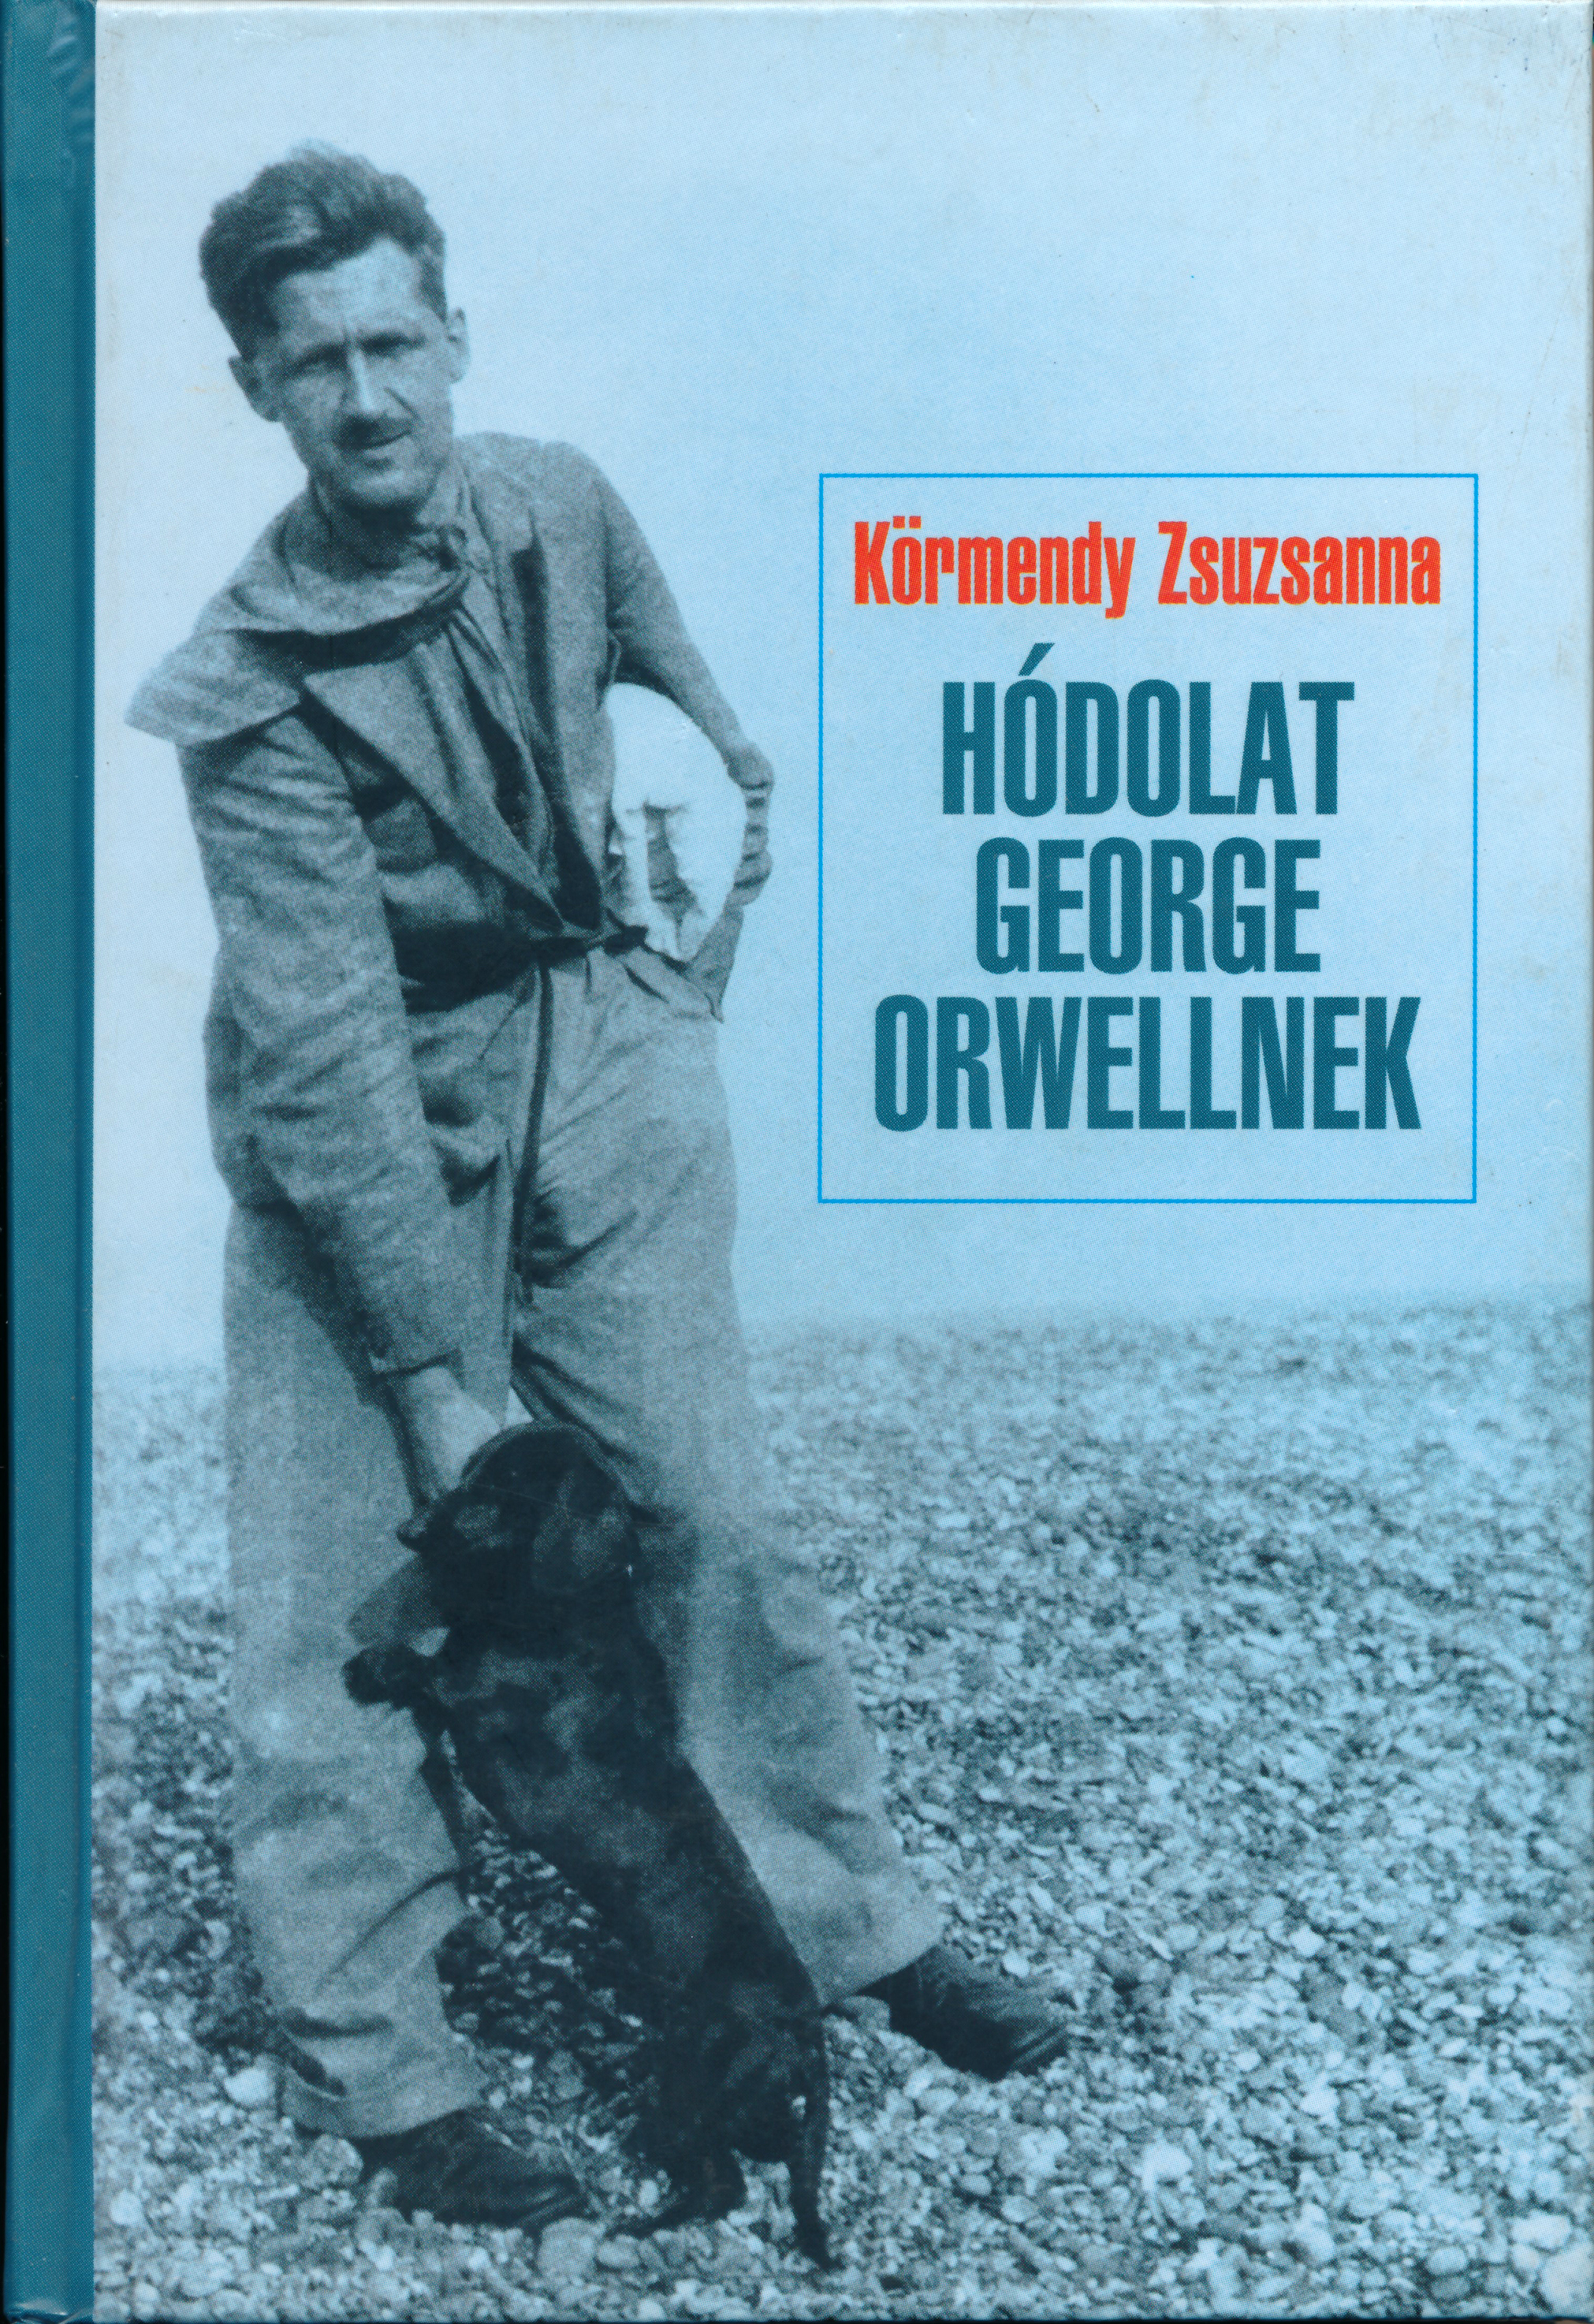 Hódolat George Orwellnek